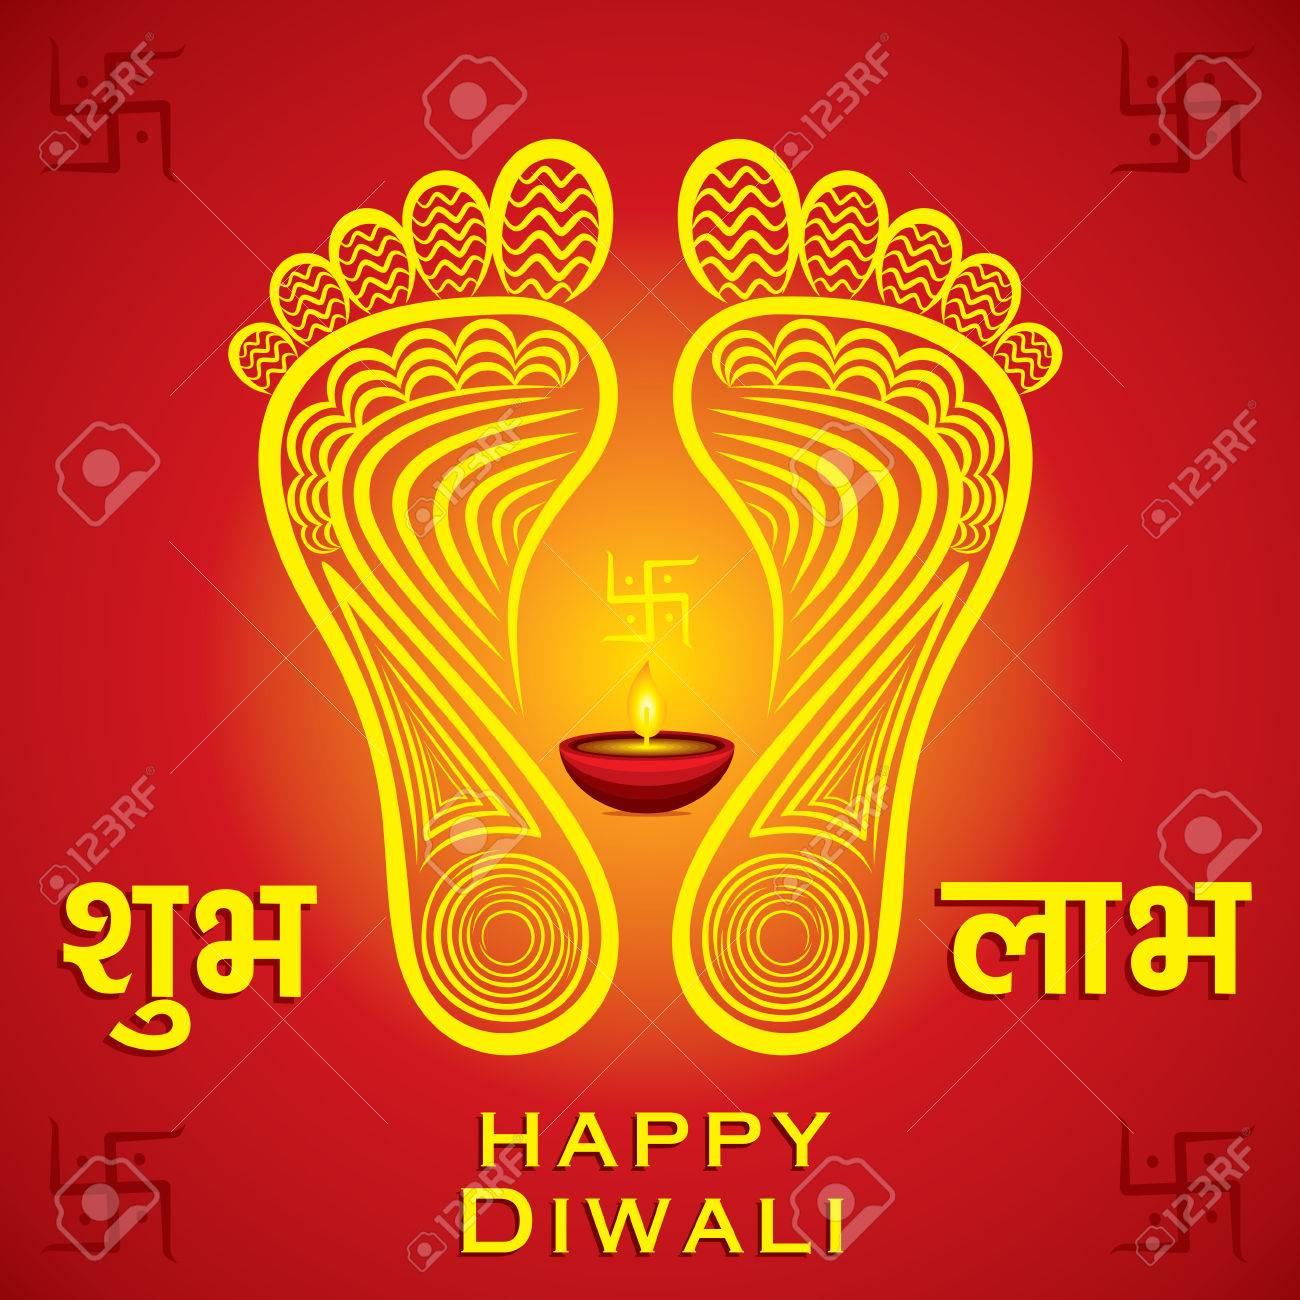 Happy diwali or navratri festival greeting card background vector happy diwali or navratri festival greeting card background vector stock vector 31510302 kristyandbryce Choice Image